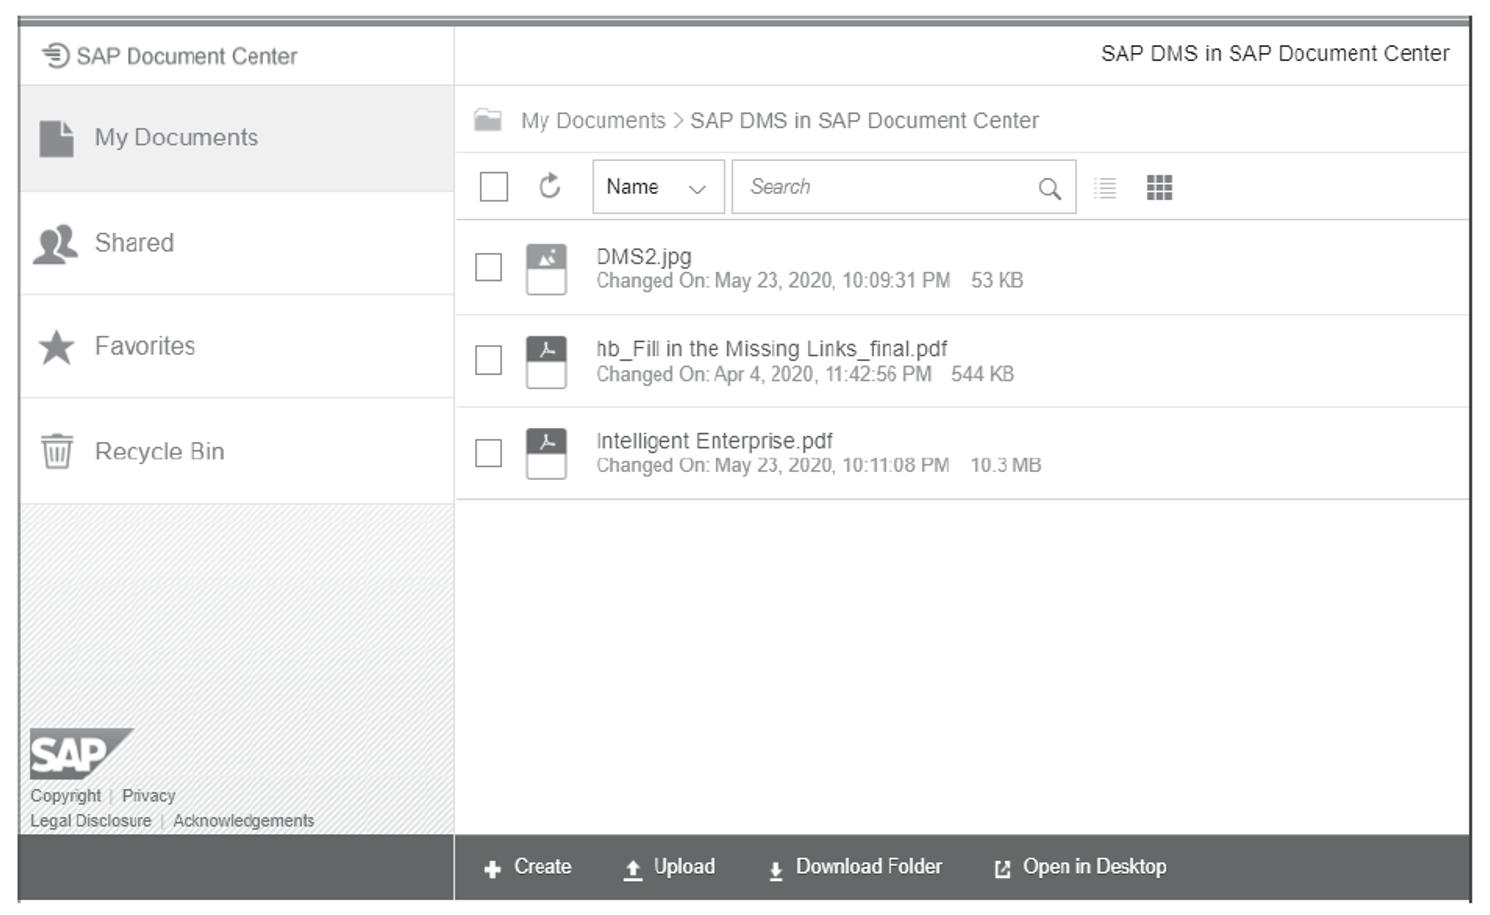 SAP Document Center: Web App